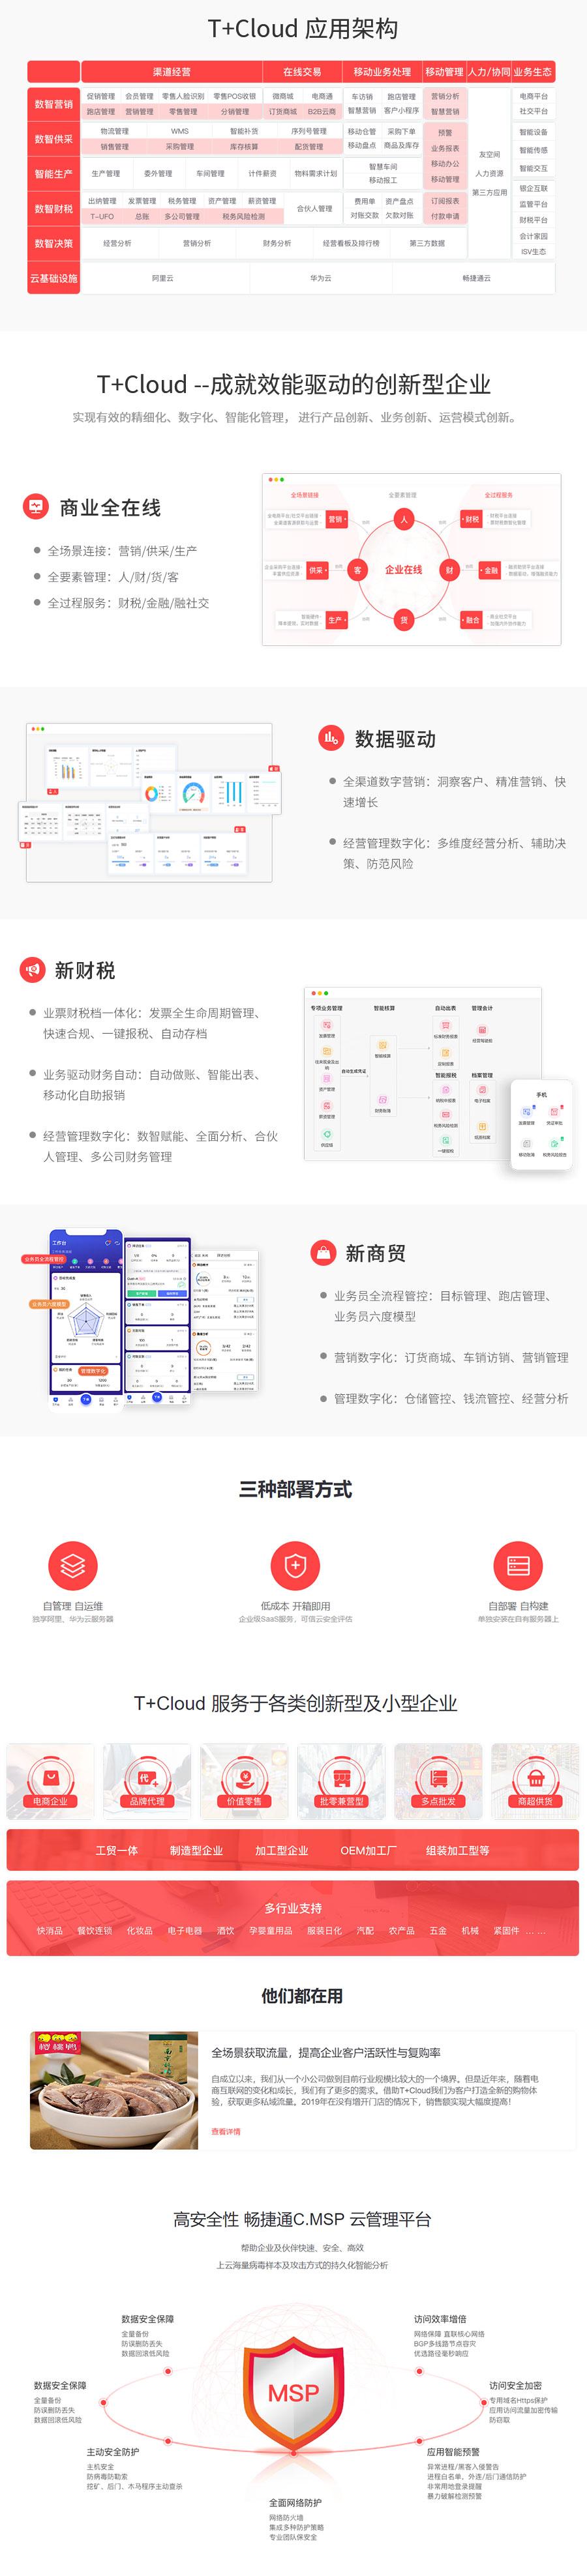 T+Cloud商业云管家.jpg